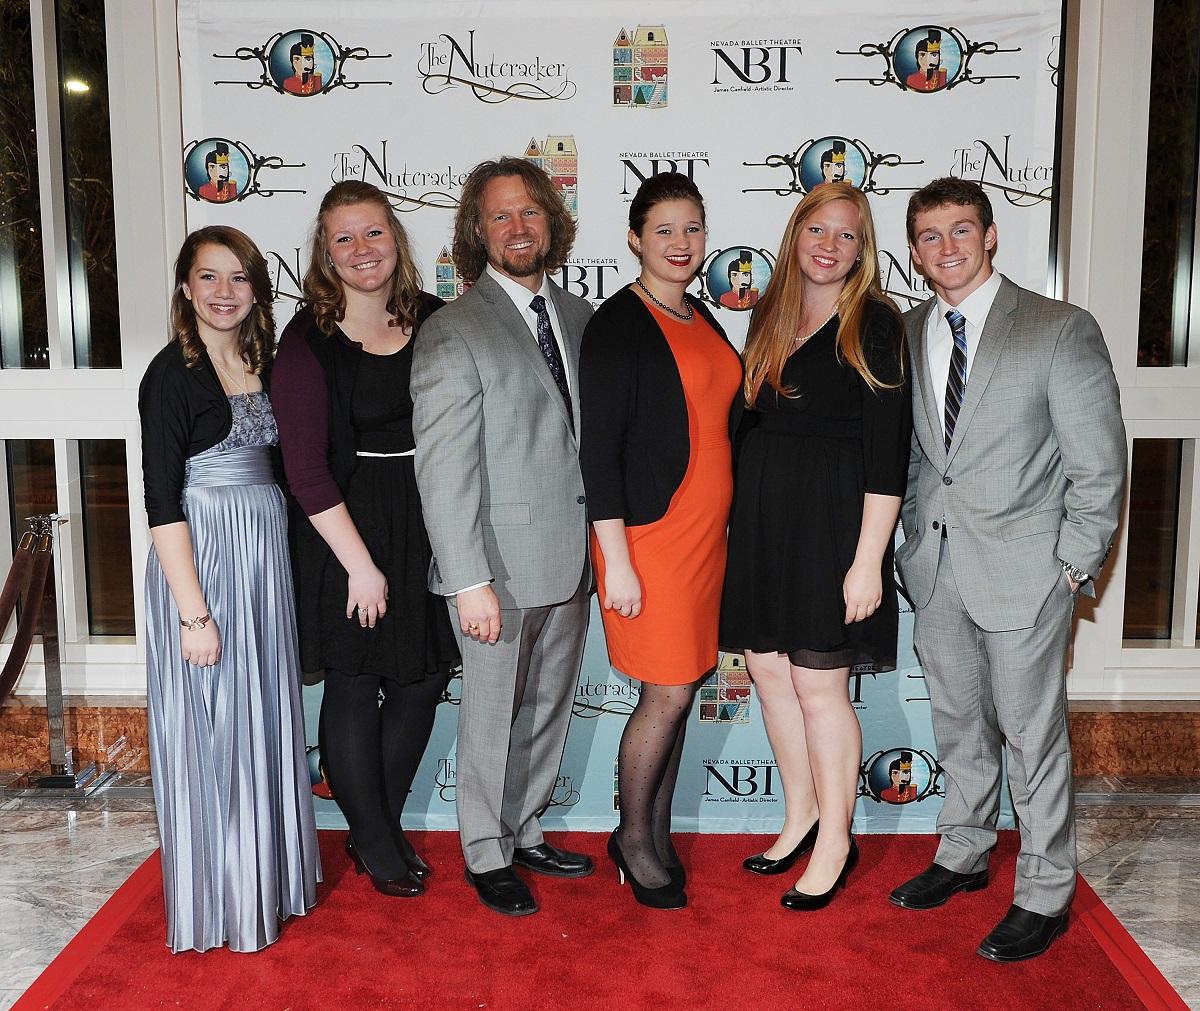 Aurora, Mariah, Kody, Mykelti, Aspyn, and Logan Brown on the red carpet in Las Vegas in 2013